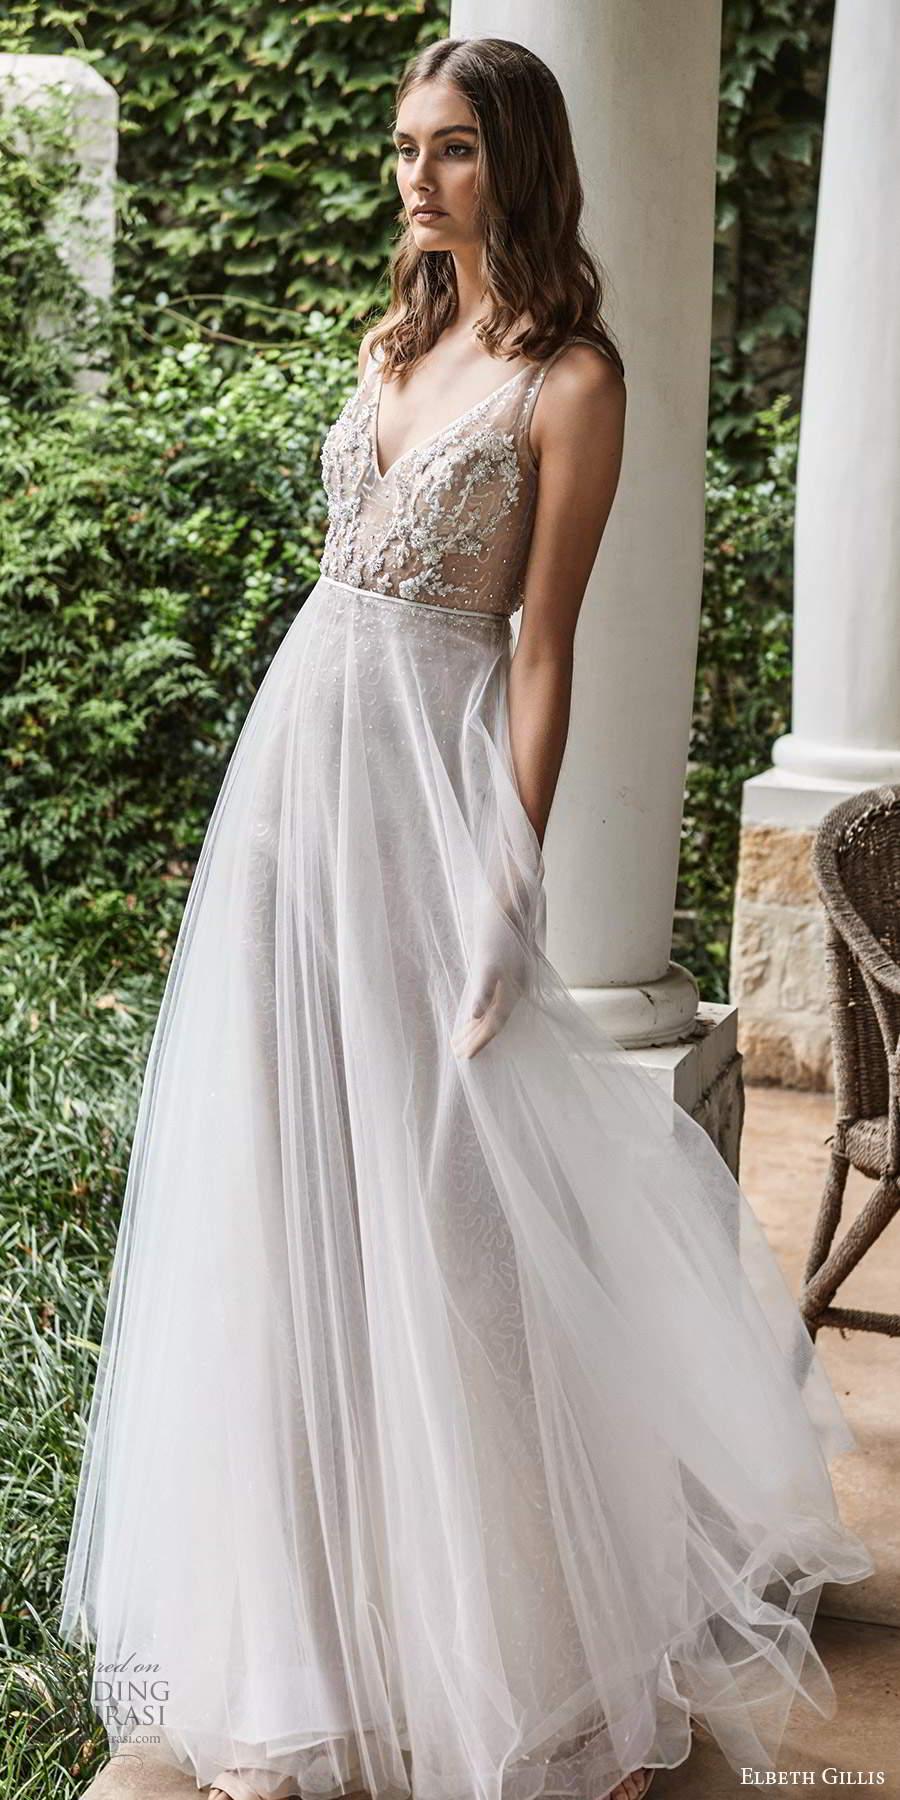 elbeth gillis 2021 bridal sleeveless straps v neckline embellished bodice a line wedding dress ball gown overskirt (6) mv